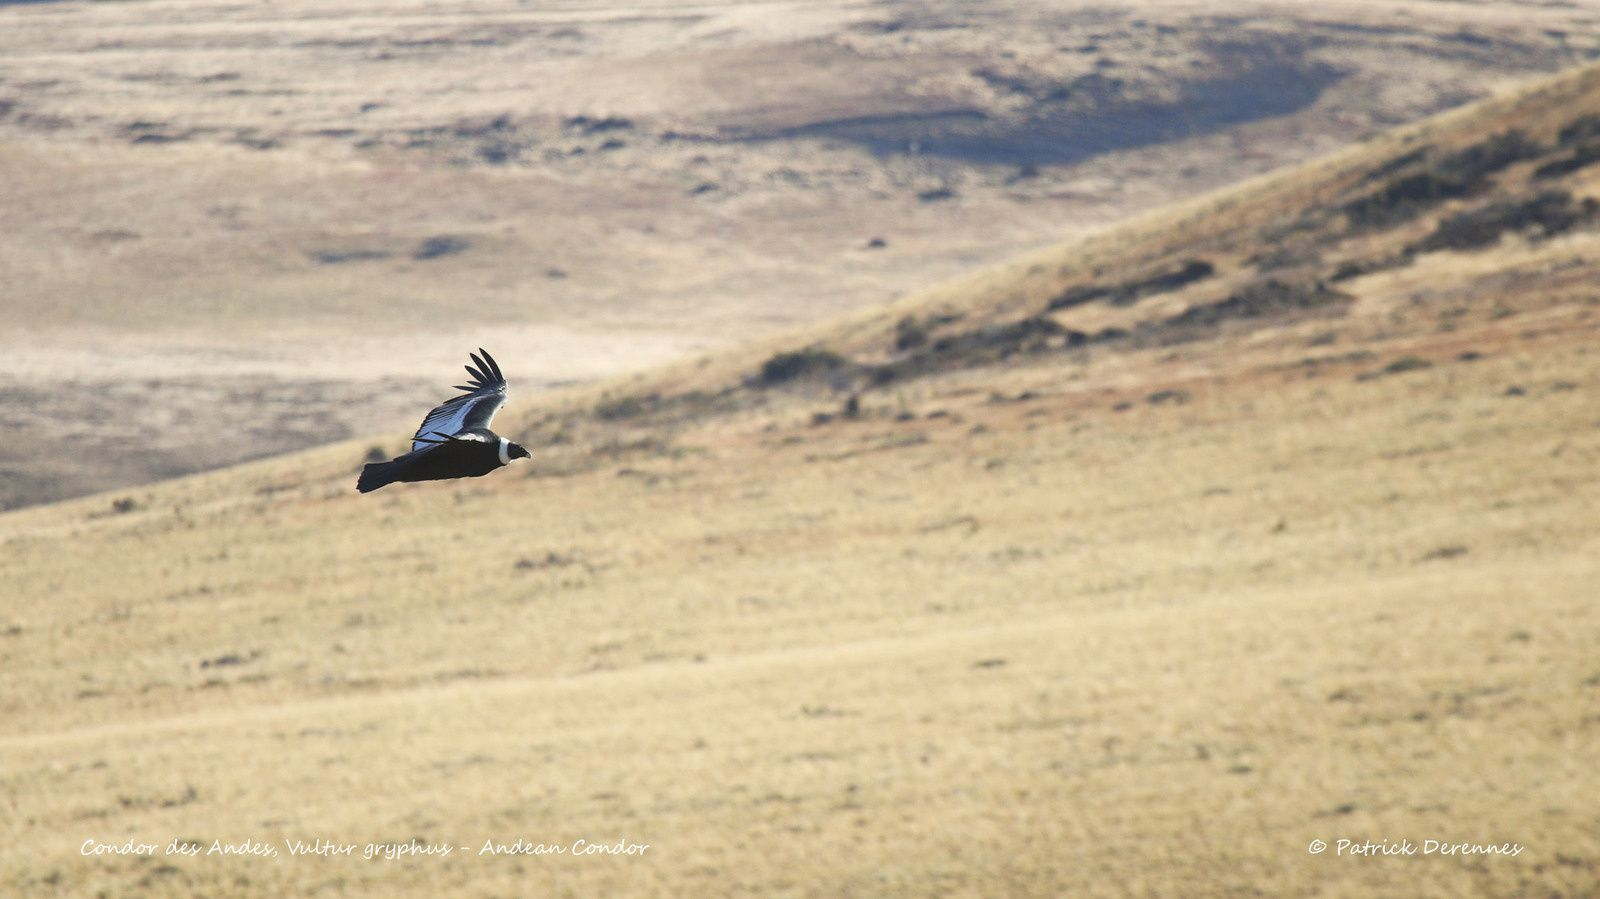 [Chili] Torres del Paine - Condor des Andes planant 1/2